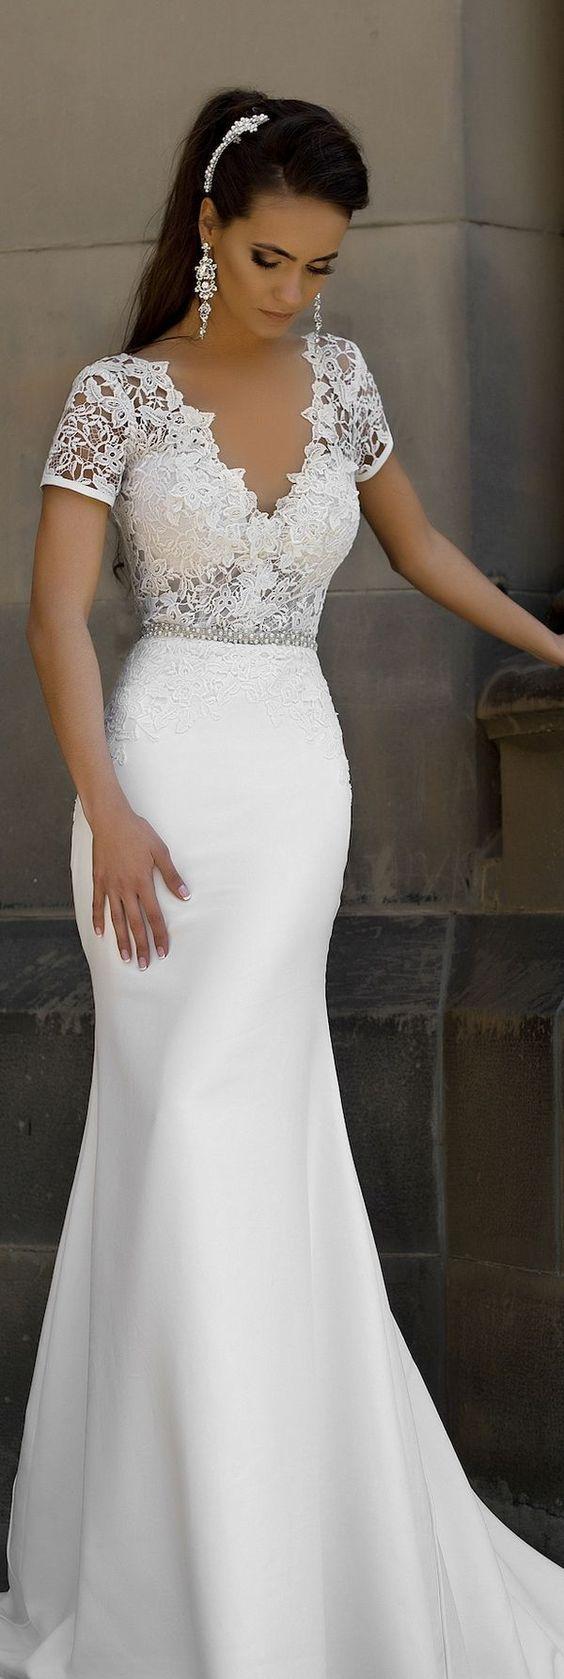 Milla nova bridal wedding dresses erpearlflowers